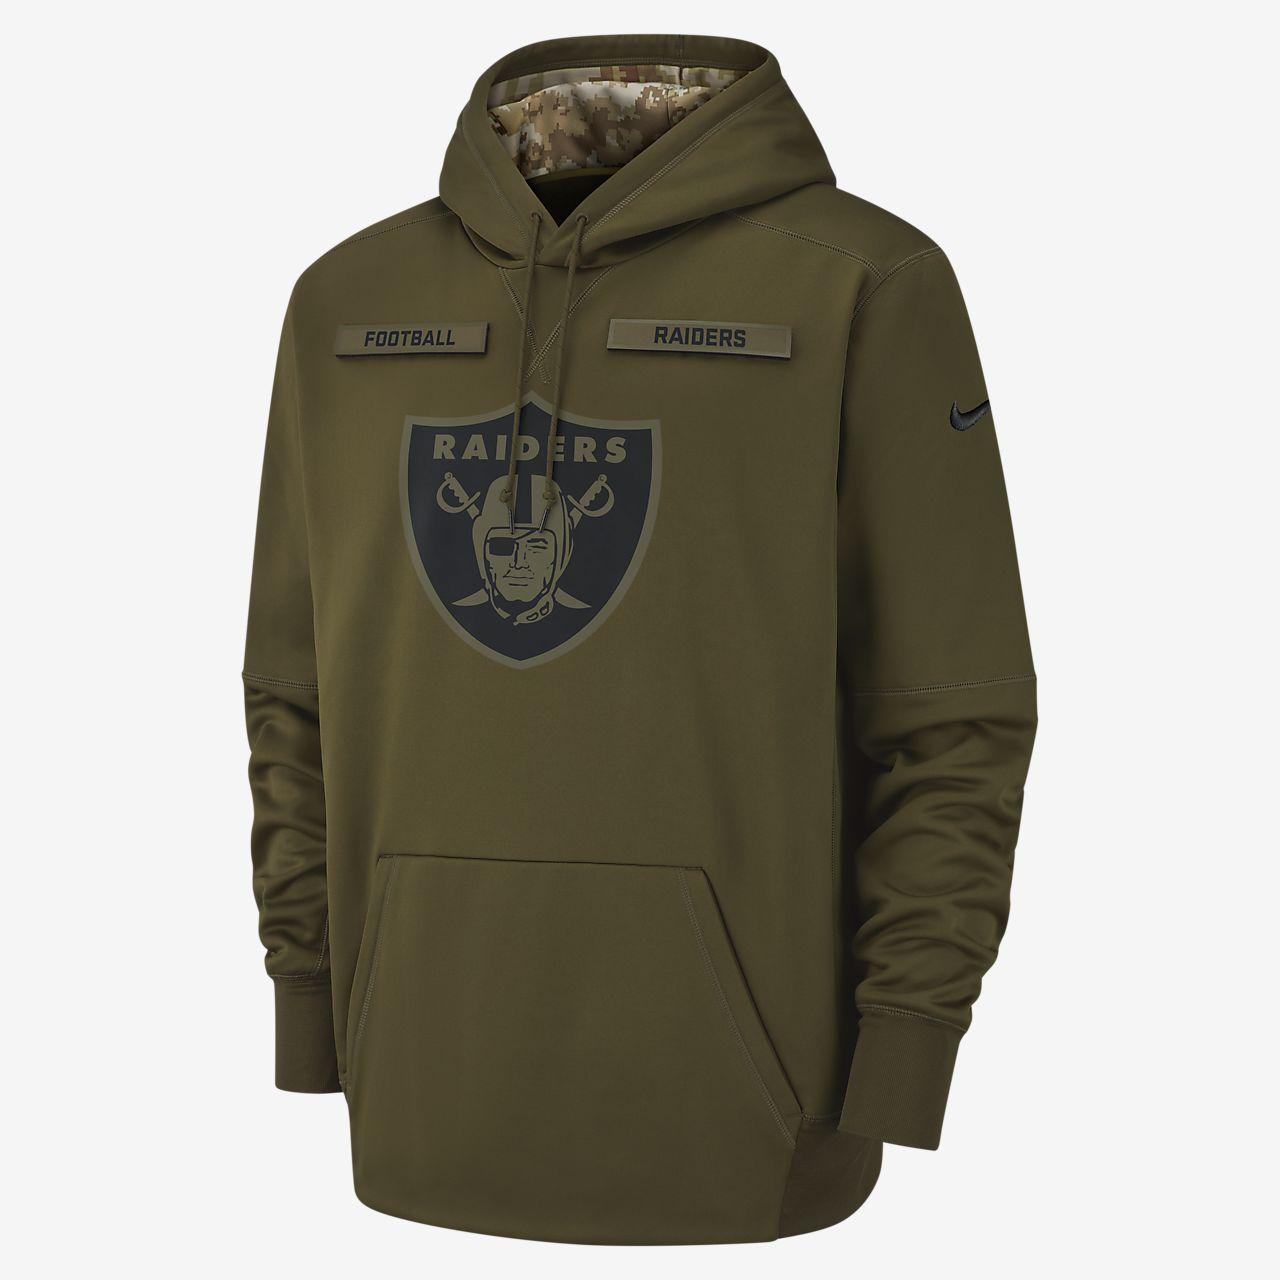 Nike Therma Salute to Service (NFL Raiders) Big Kids' Hoodie